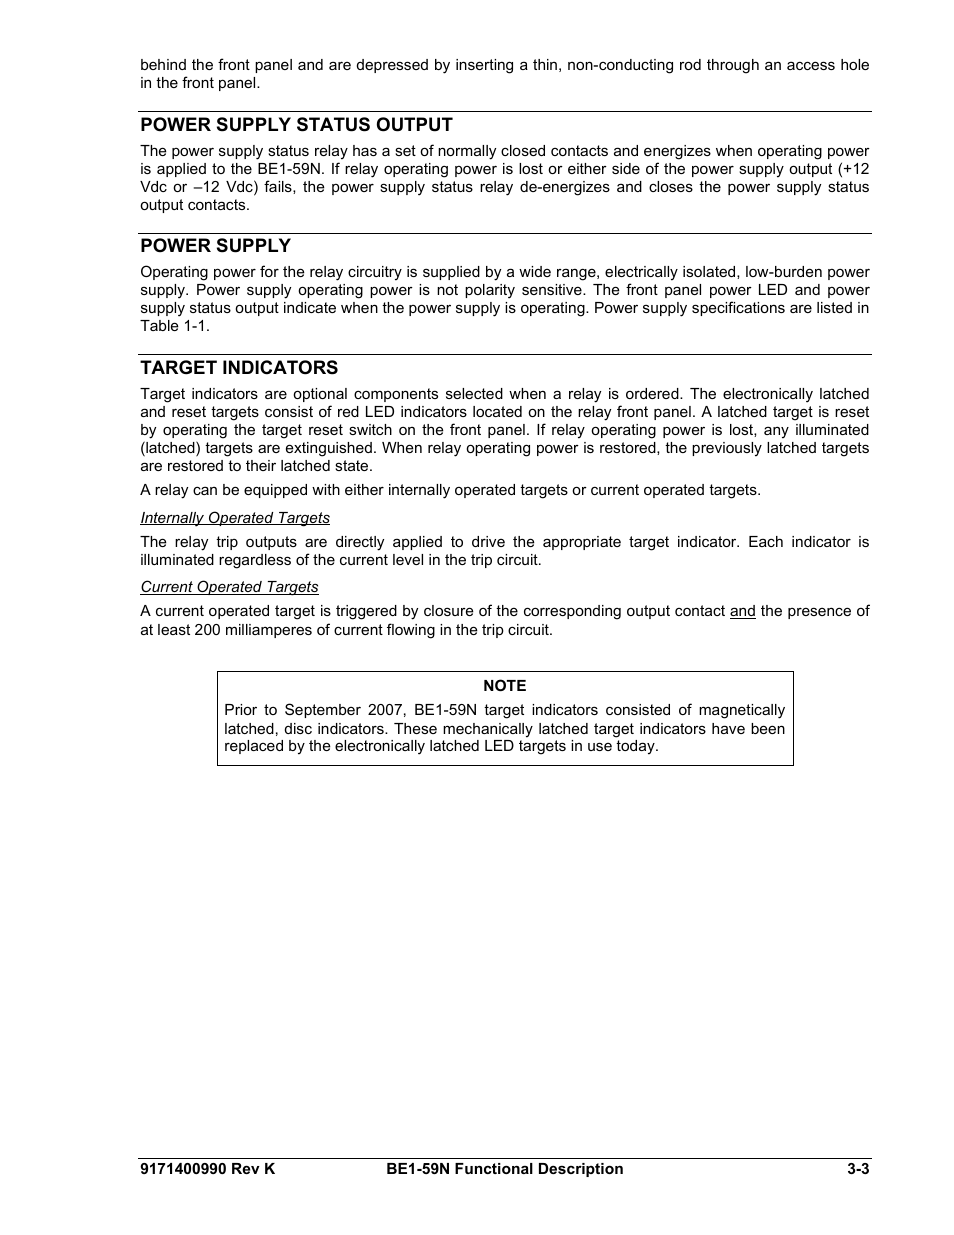 Power Supply Status Output Target Indicators Basler Relay Latching Electric Be1 59n User Manual Page 21 40